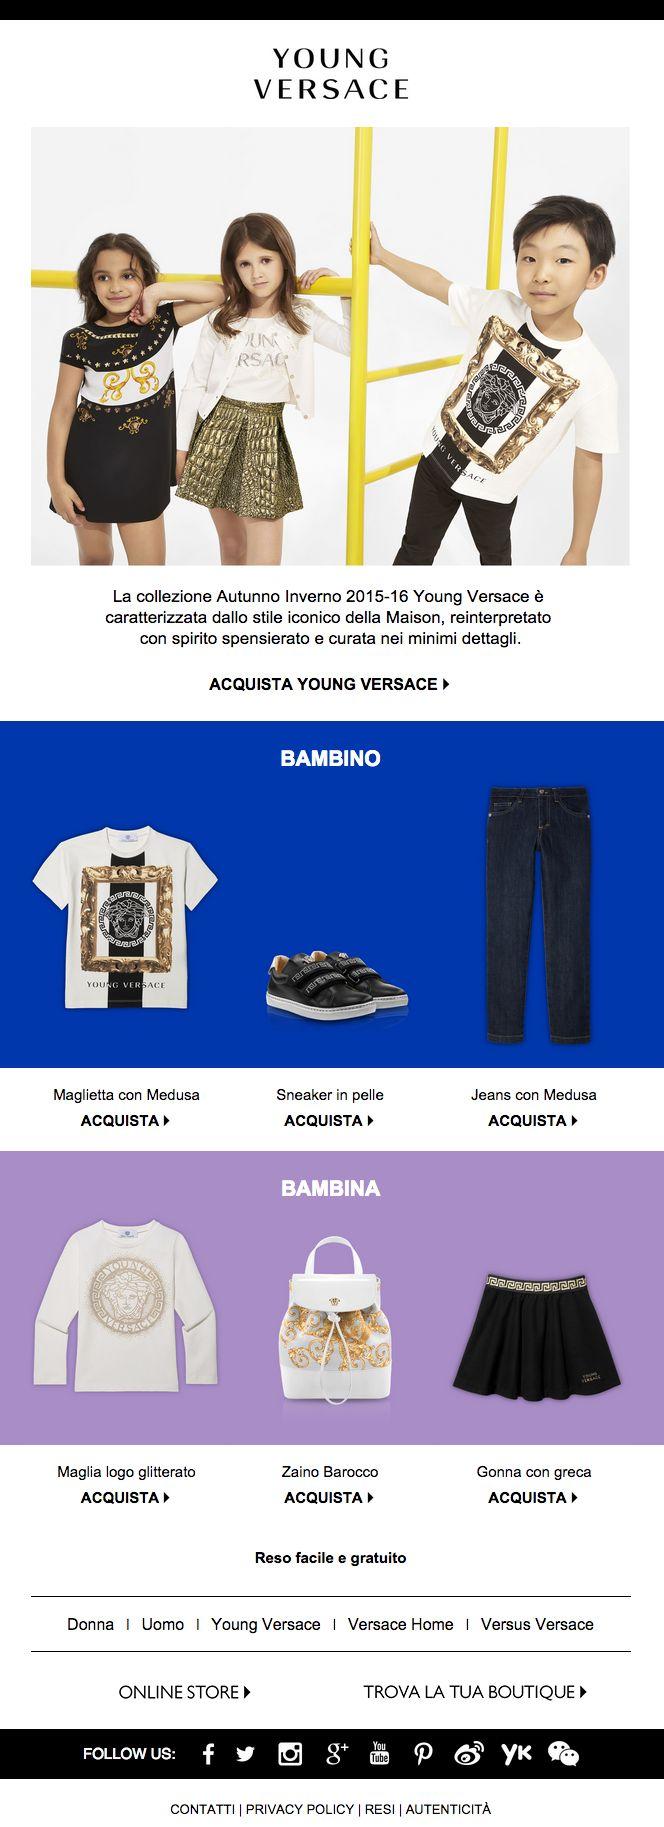 Versace | Back to school con Young Versace